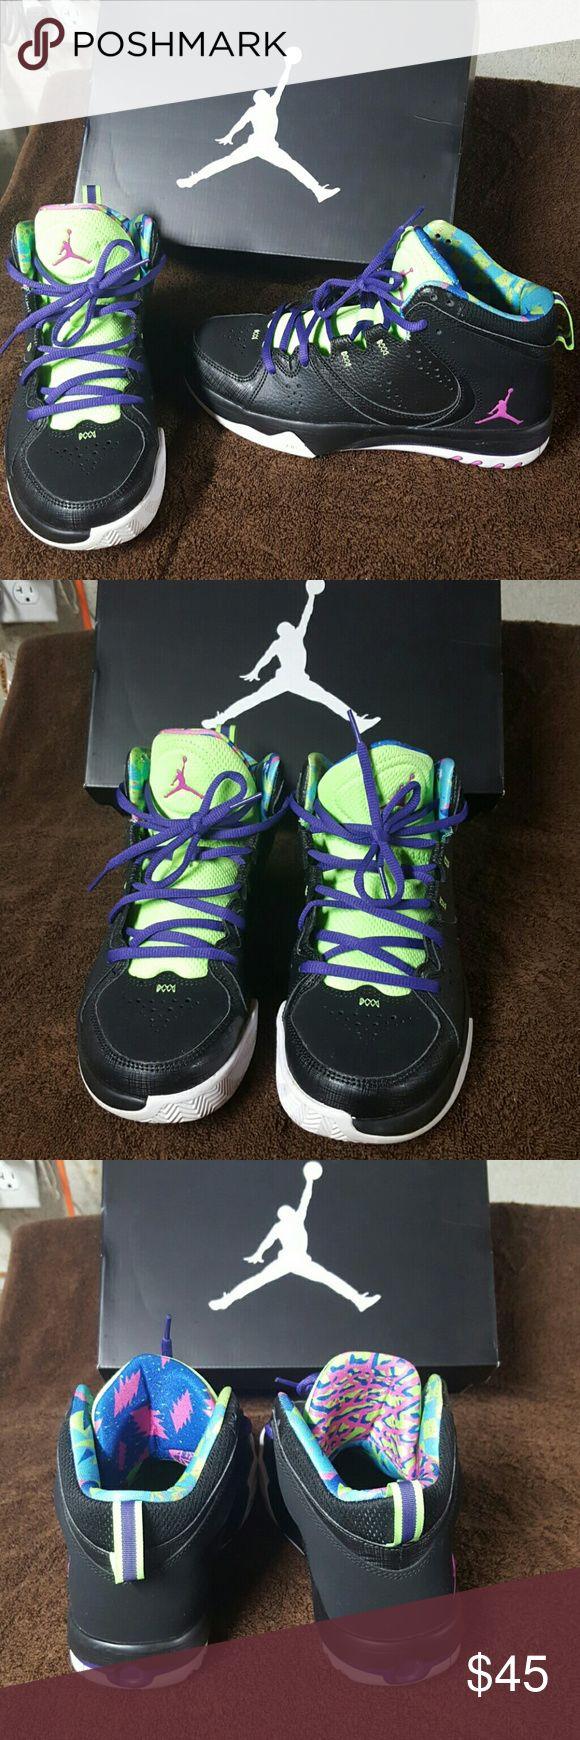 ⤵💲JORDAN'S Jordan's Phase 23 2 (GS) Non smoking home  No trades Jordan Shoes Sneakers